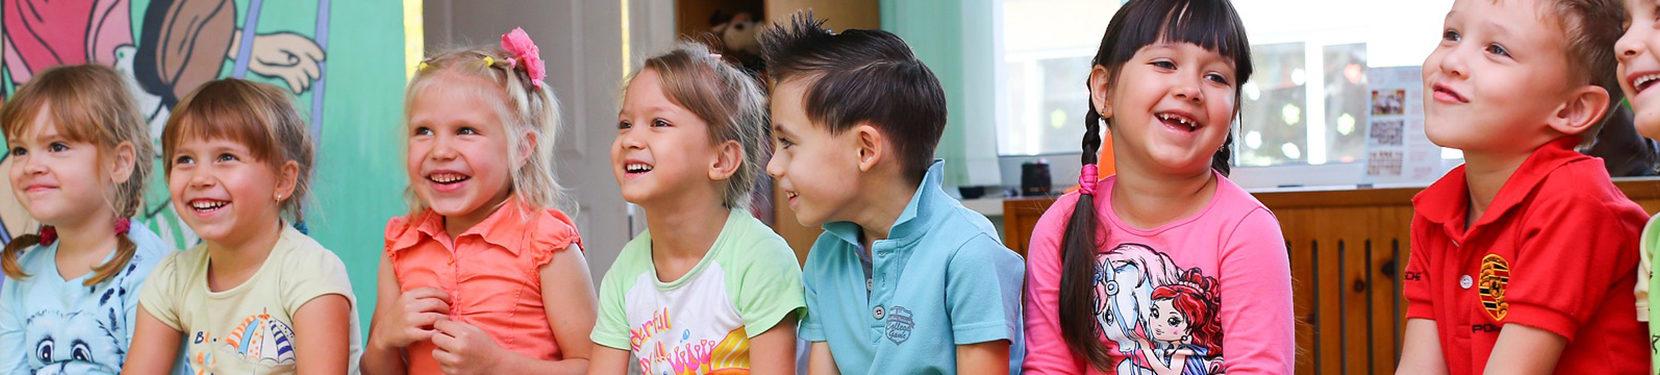 Kindergärten/Schulen